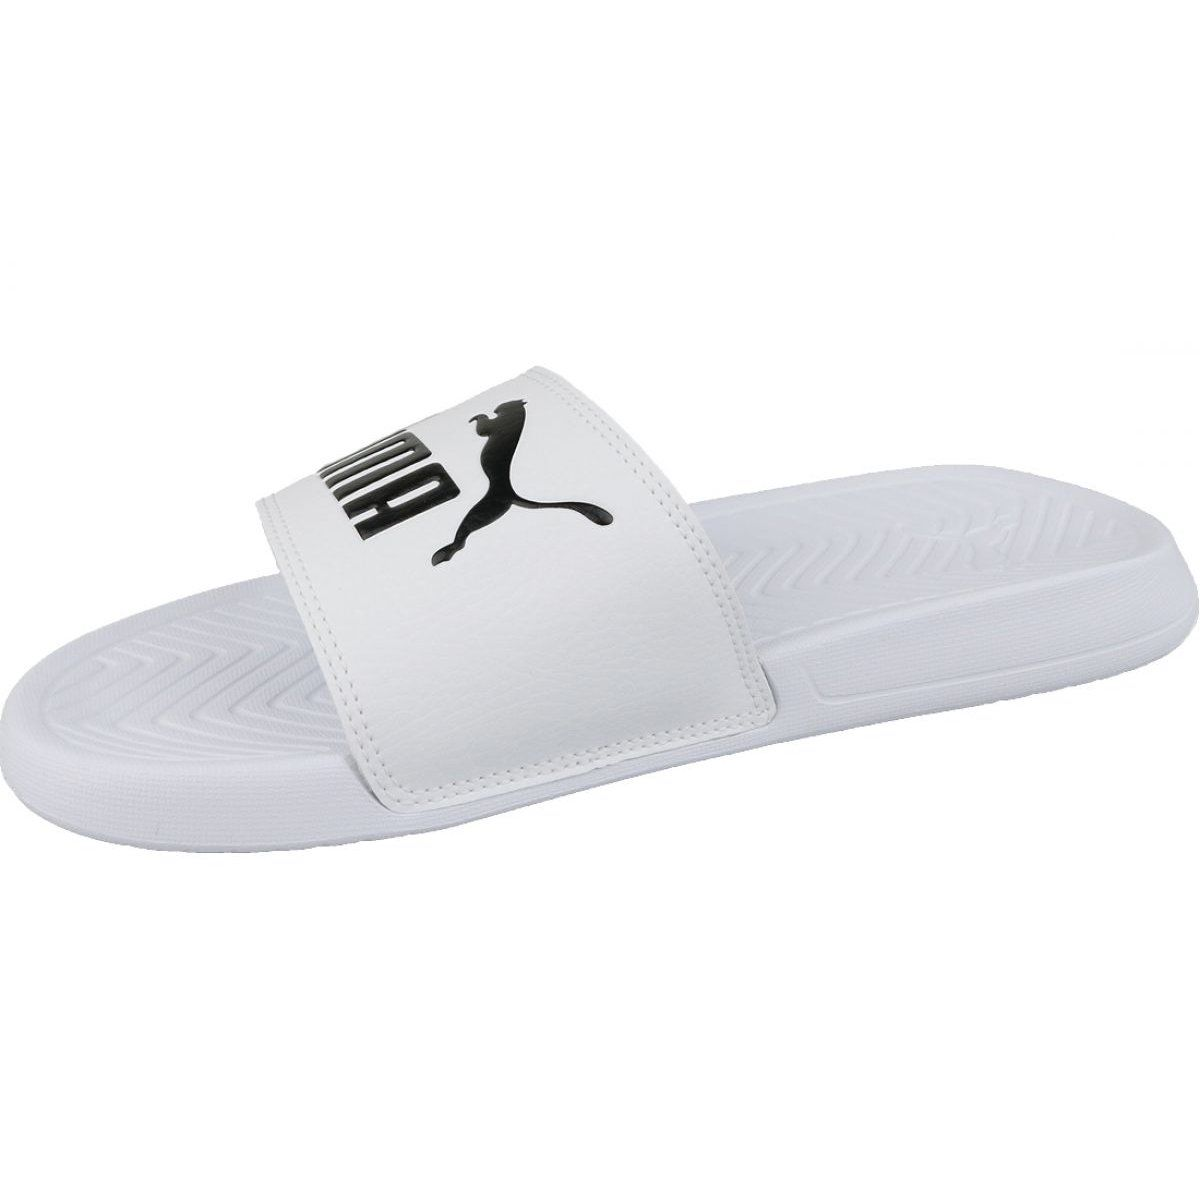 puma mens slippers